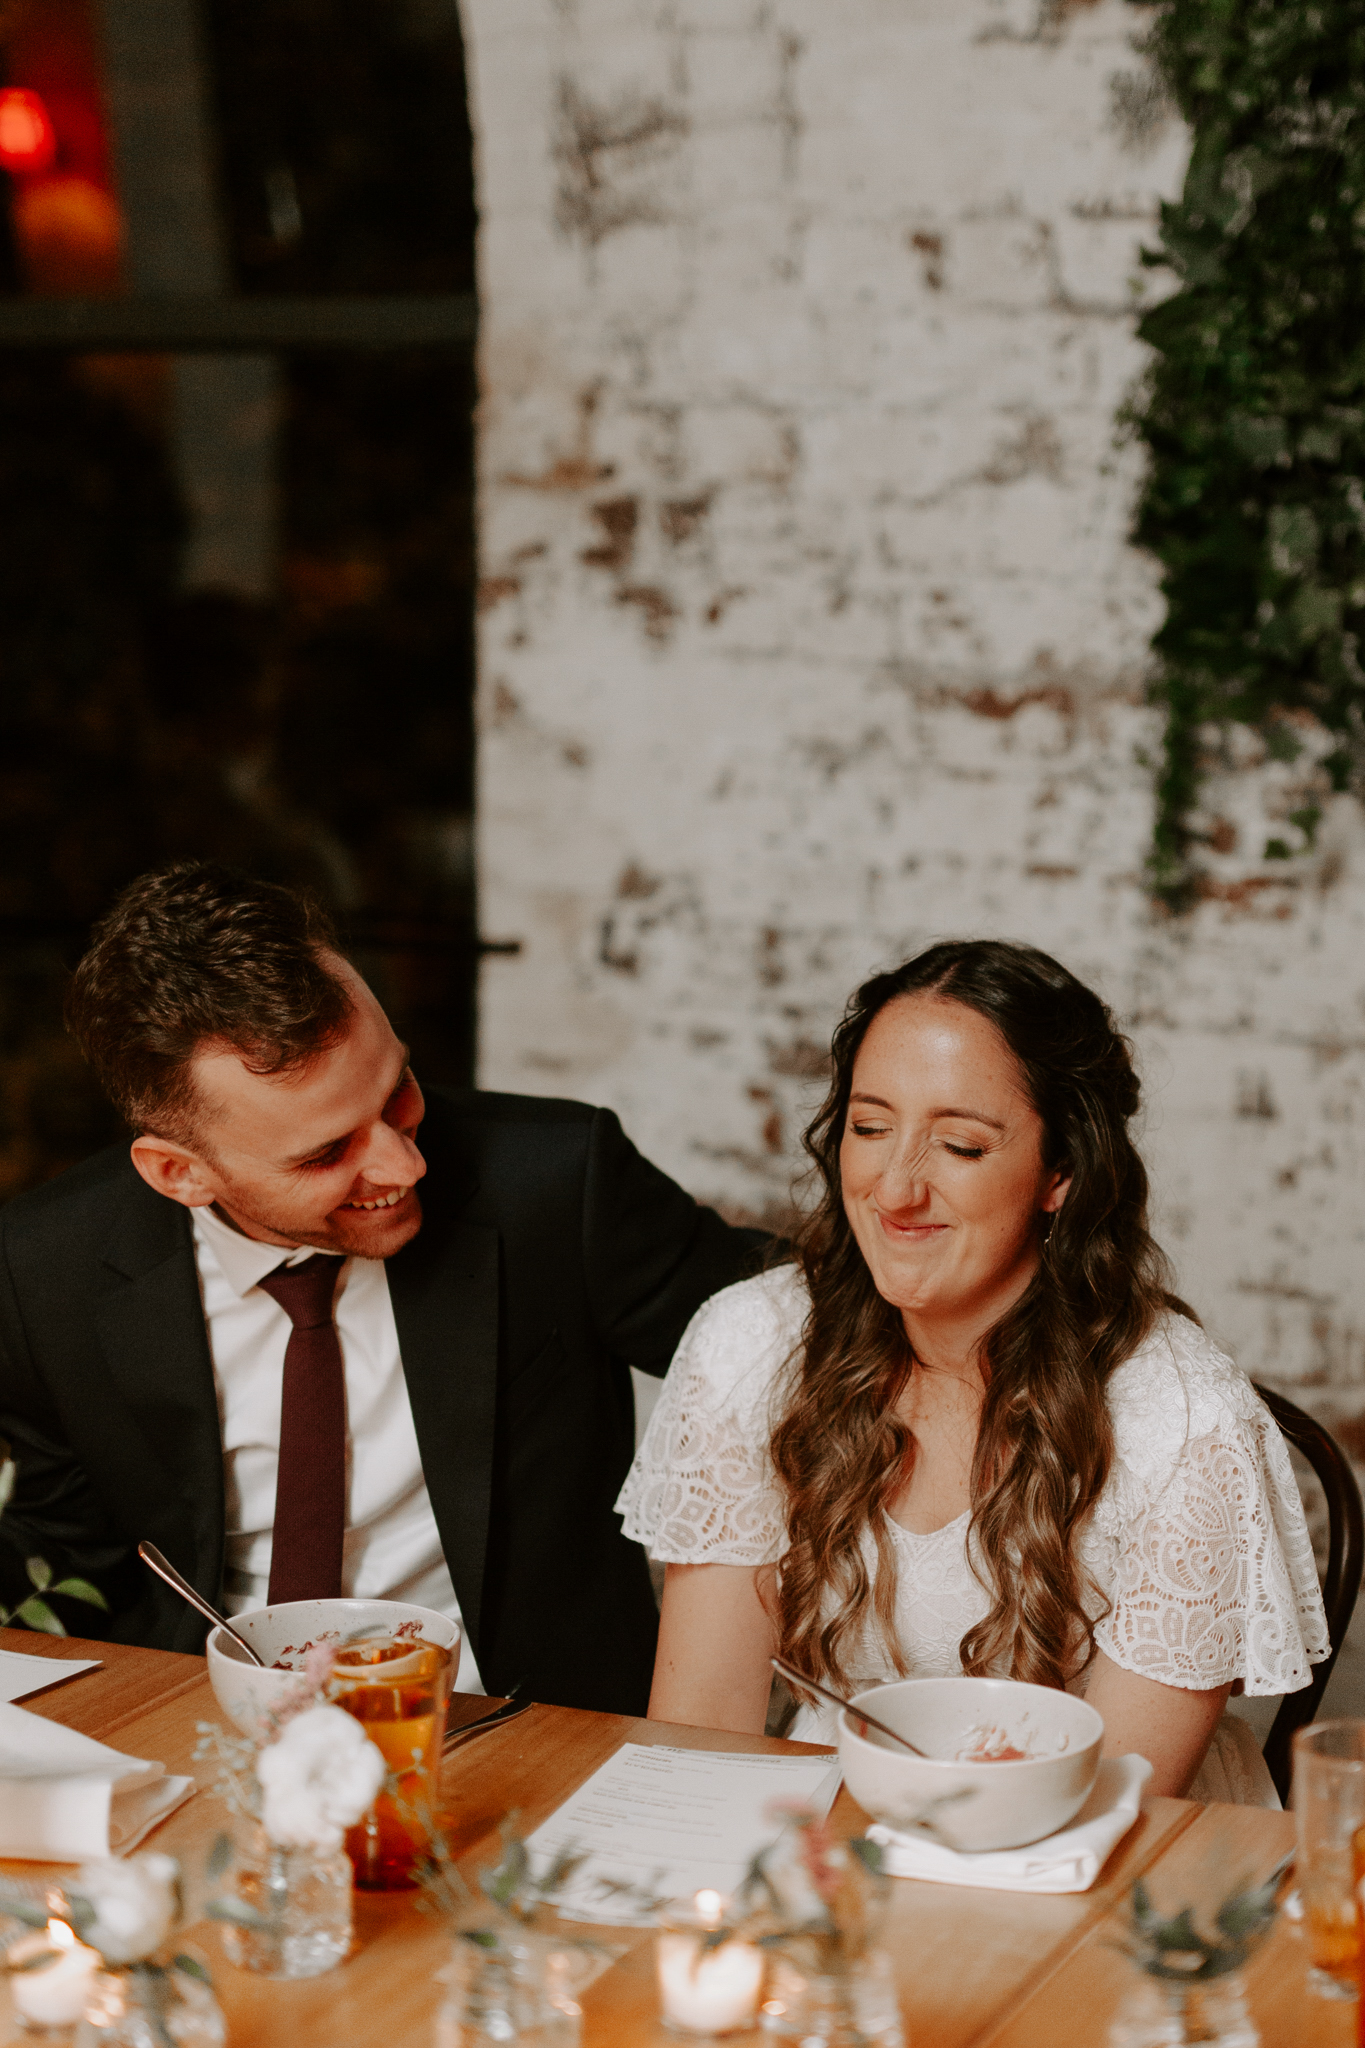 Panama-Dining-Room-wedding-emotionsandmath-046.jpg